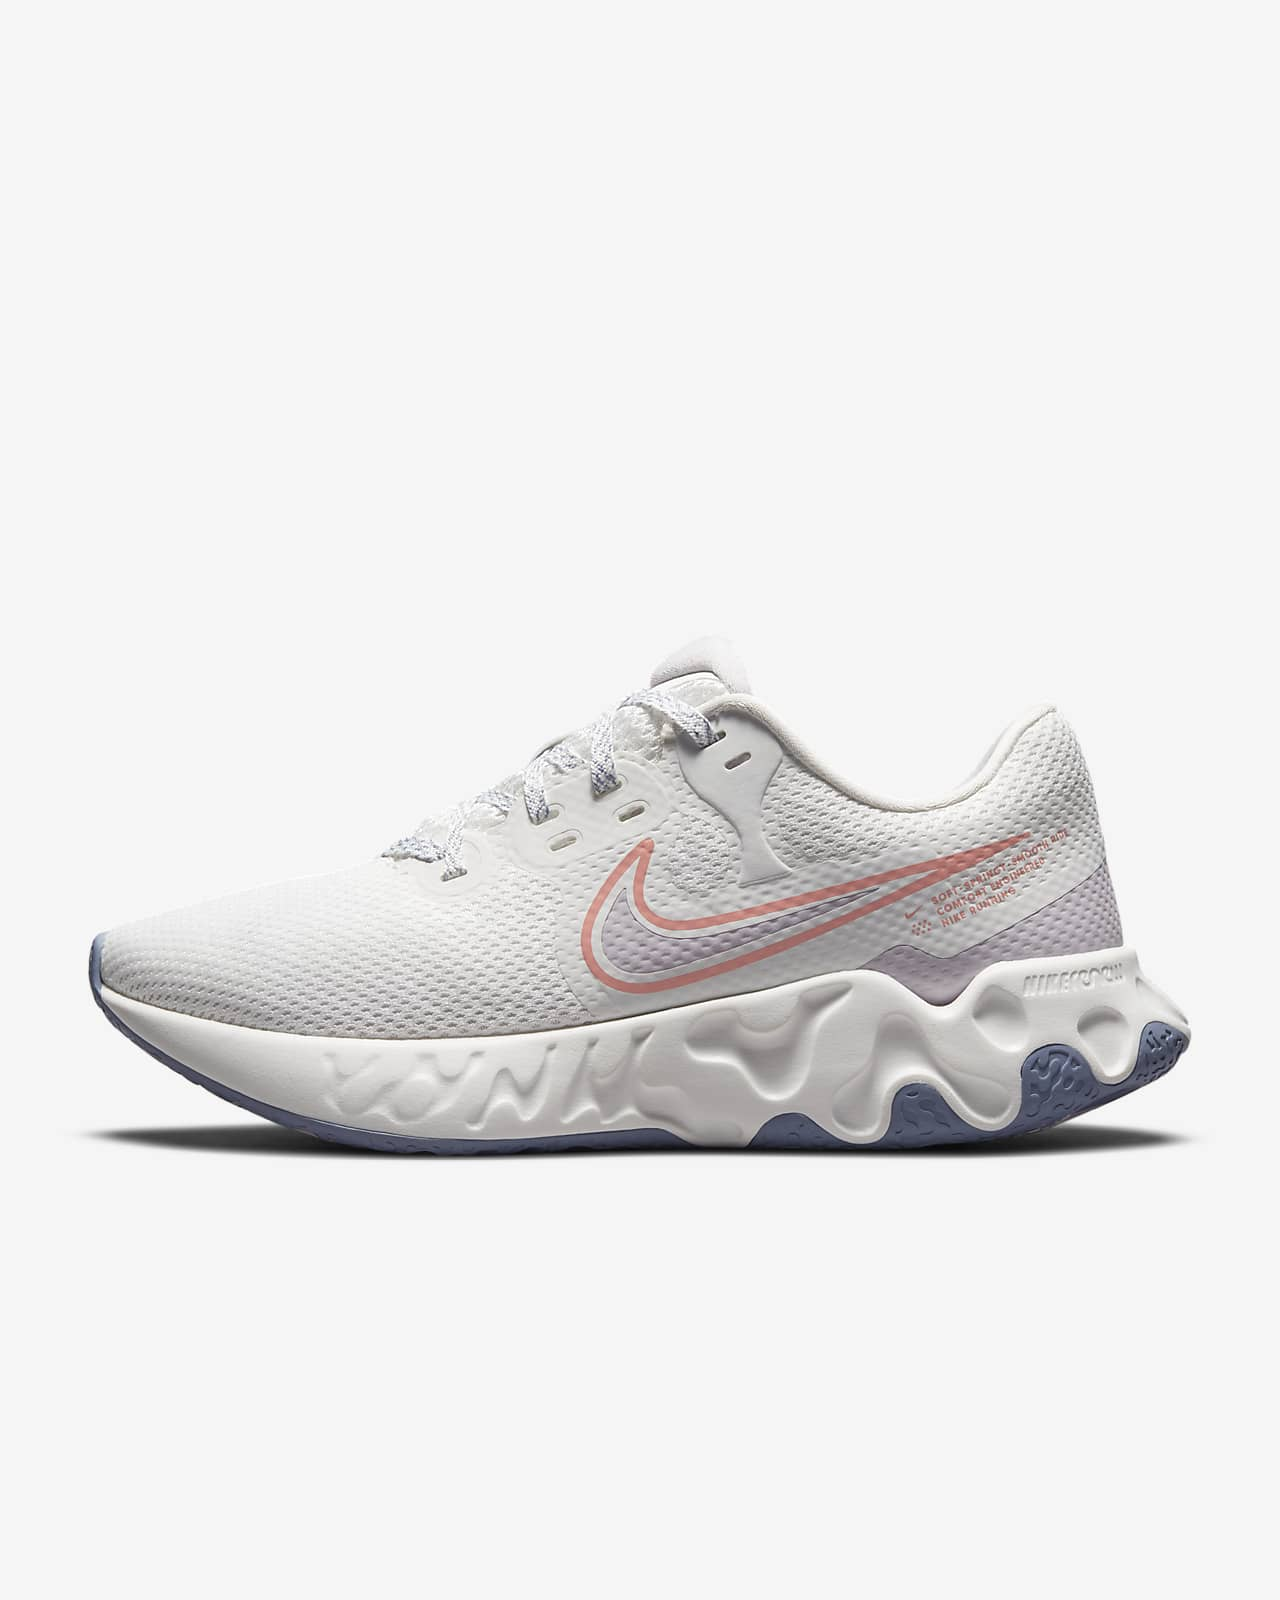 Calzado de running para mujer Nike Renew Ride 2